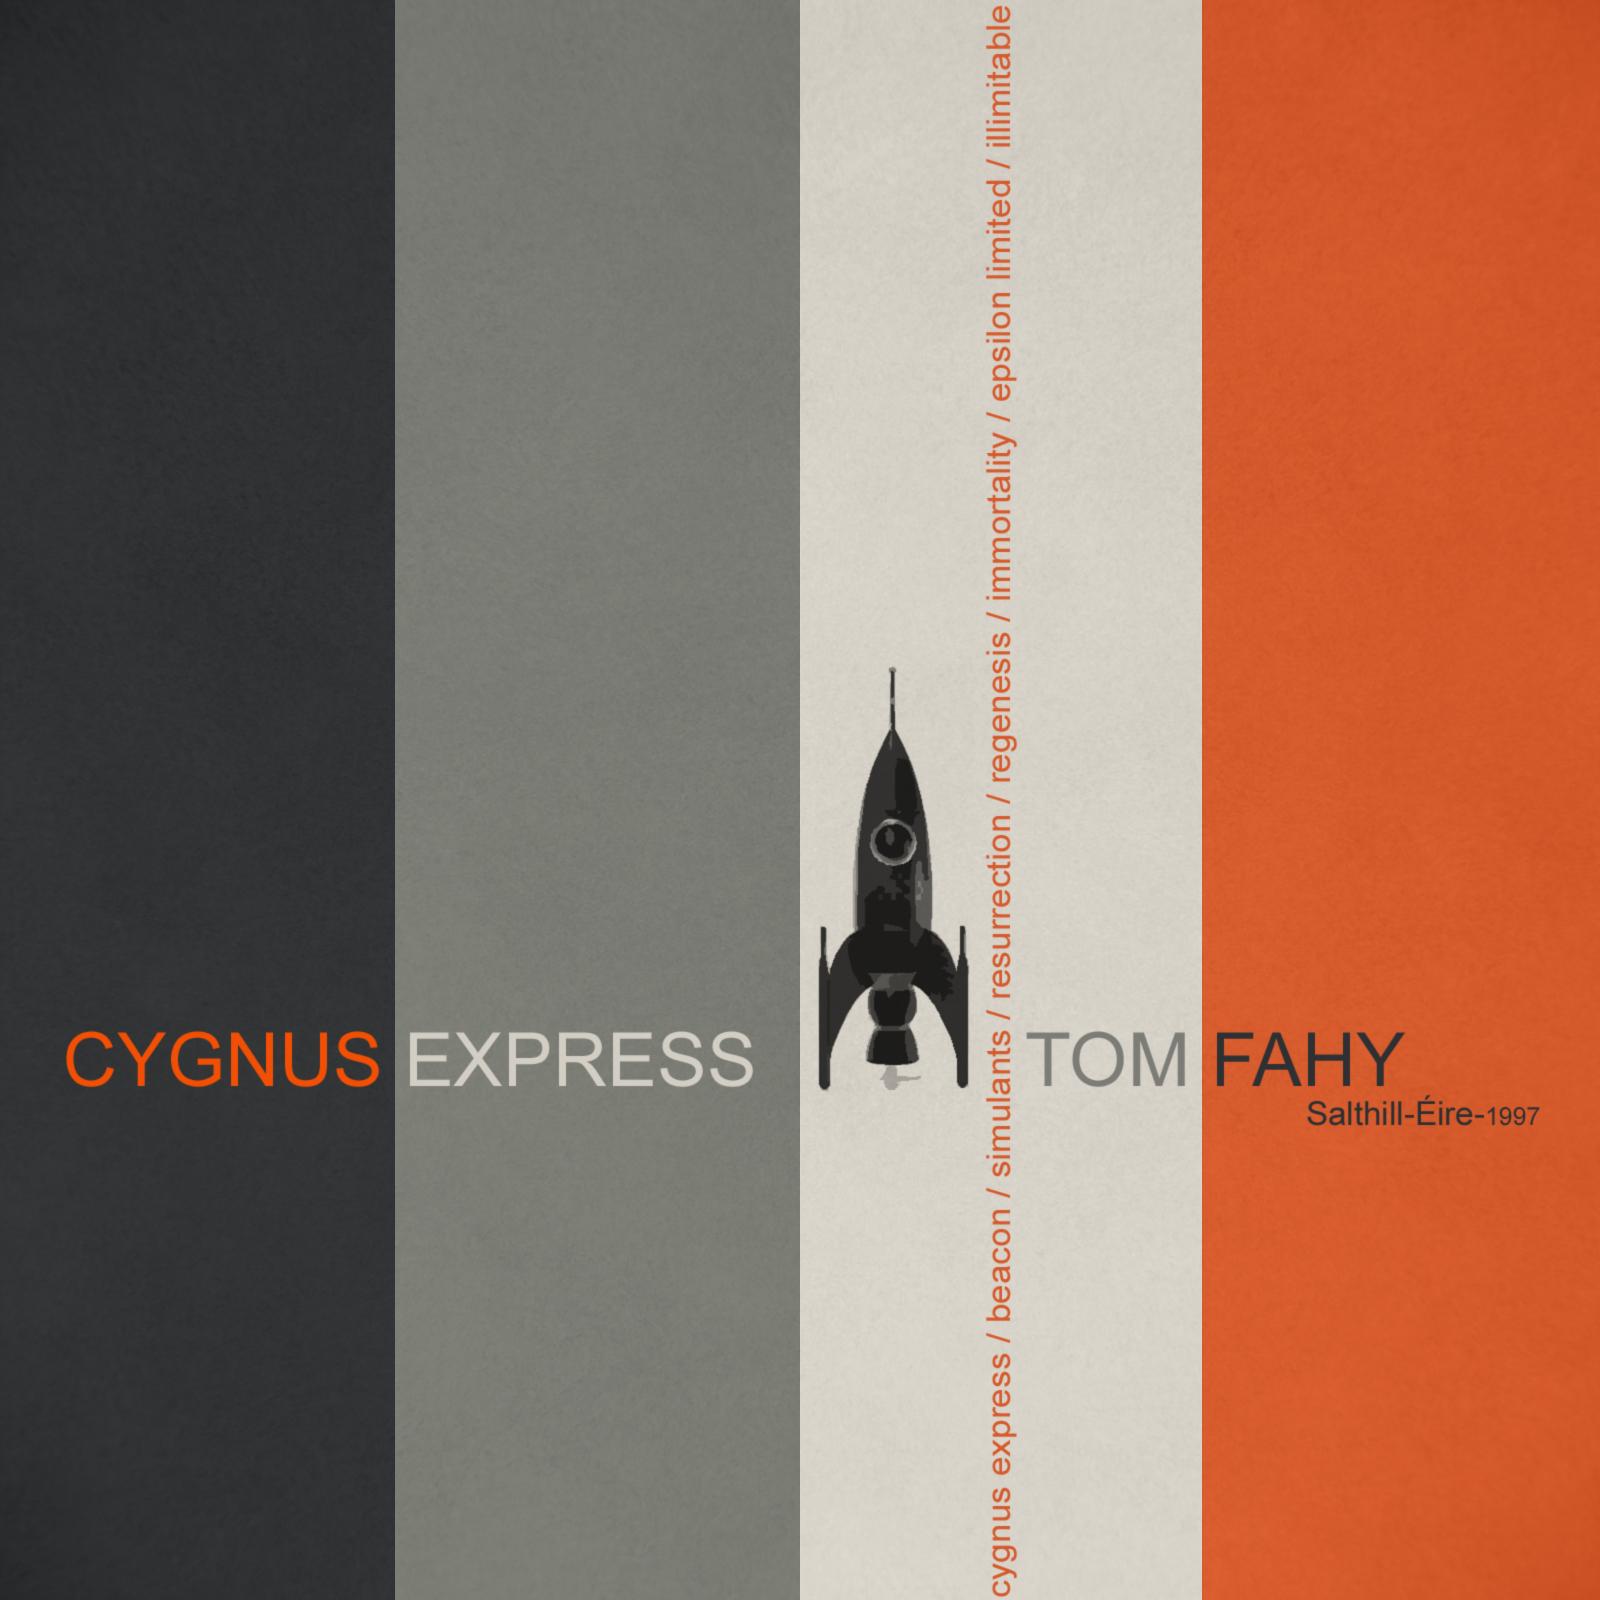 Cygnus Express by Tom Fahy